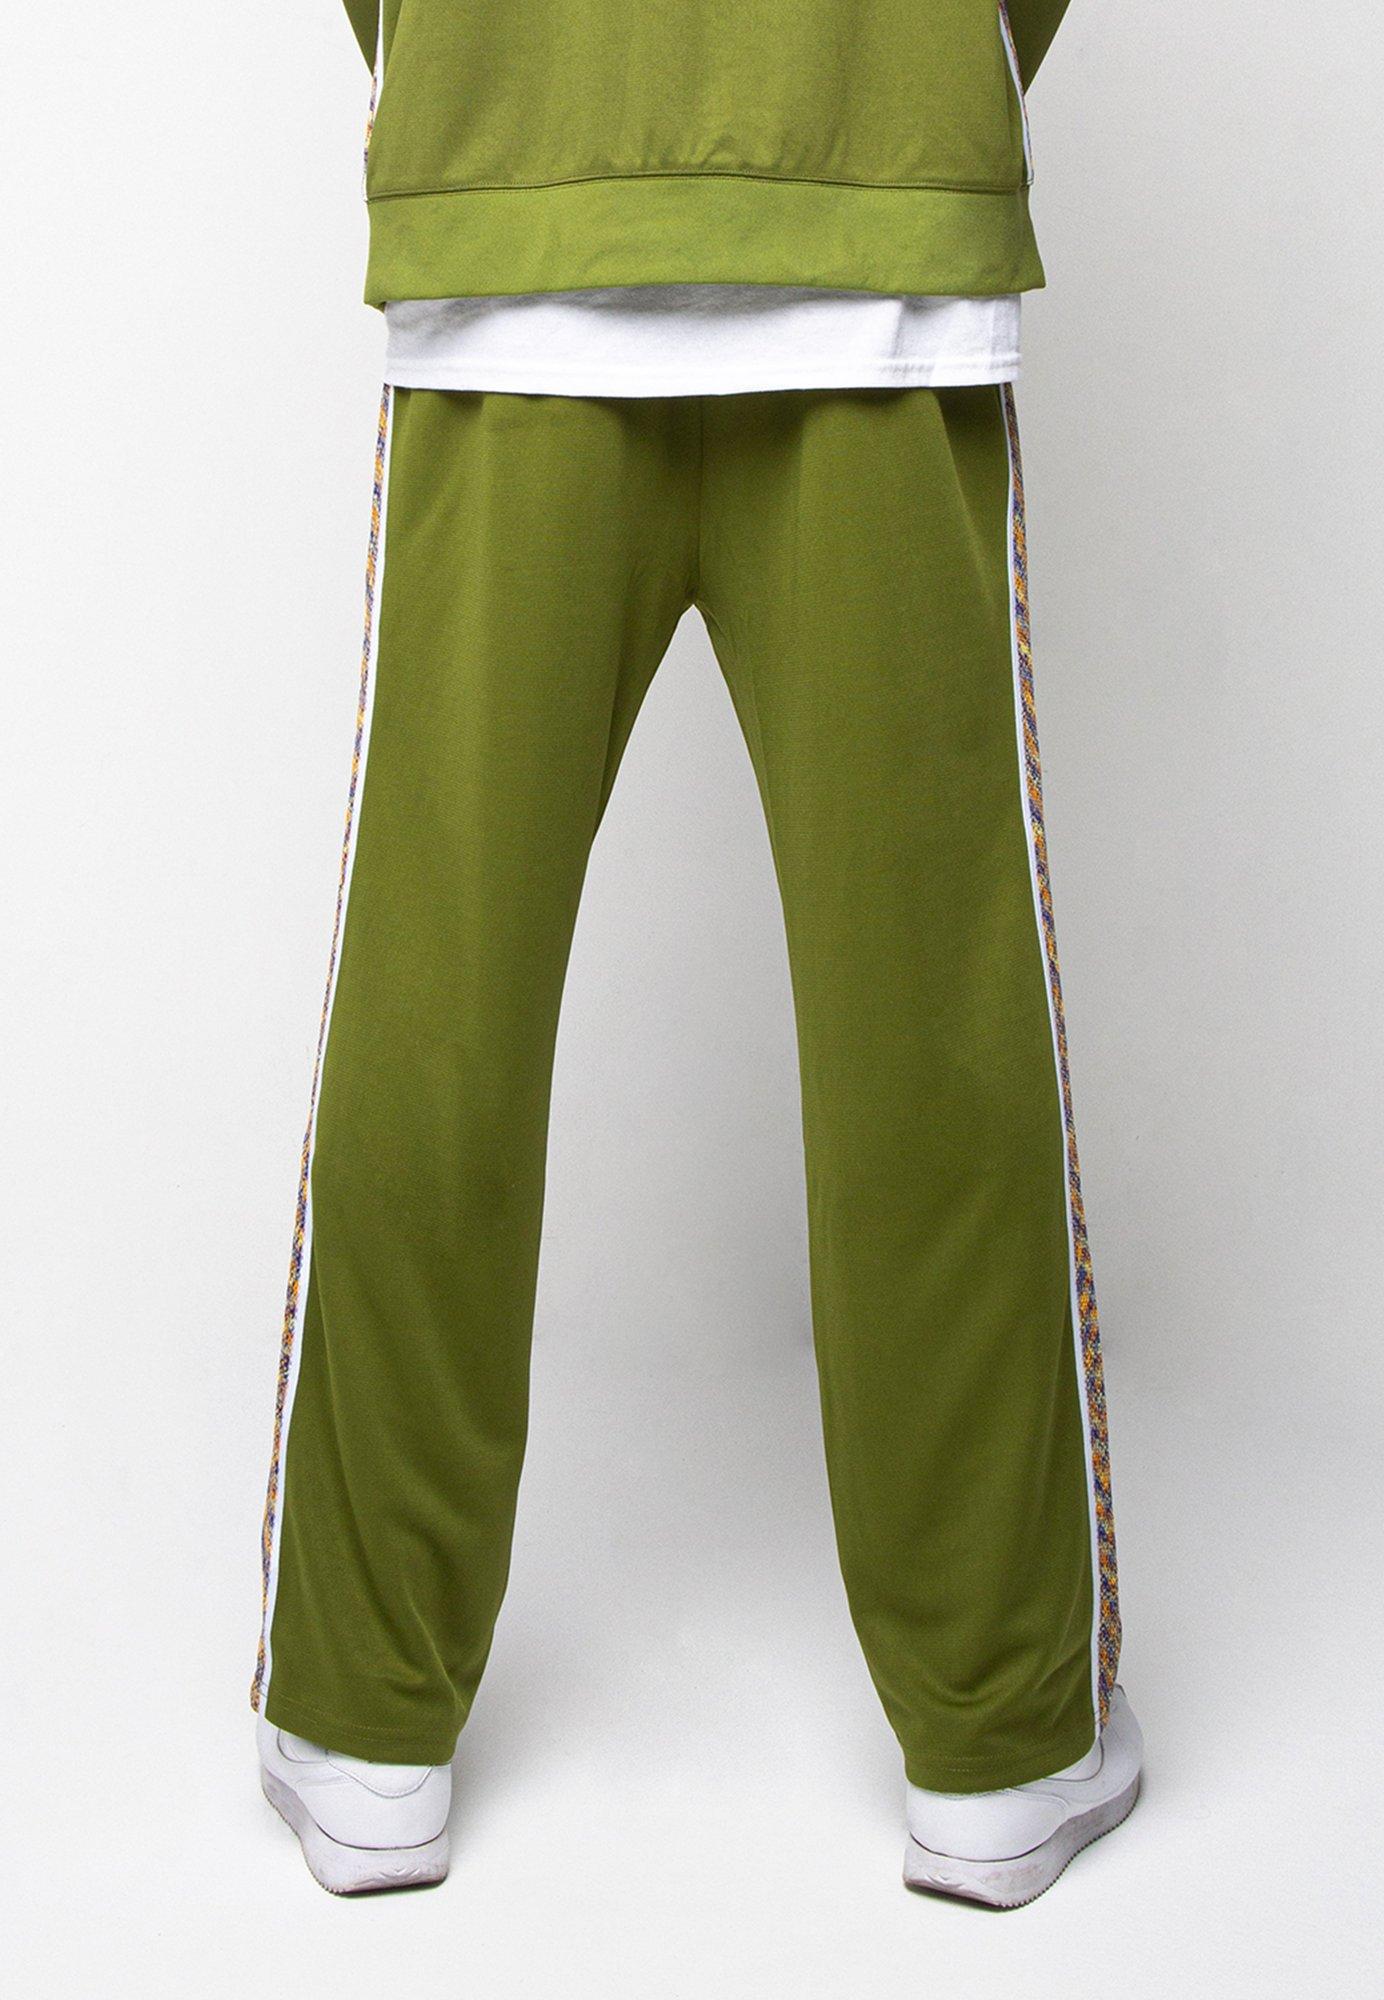 Image of ES Green Track Pants